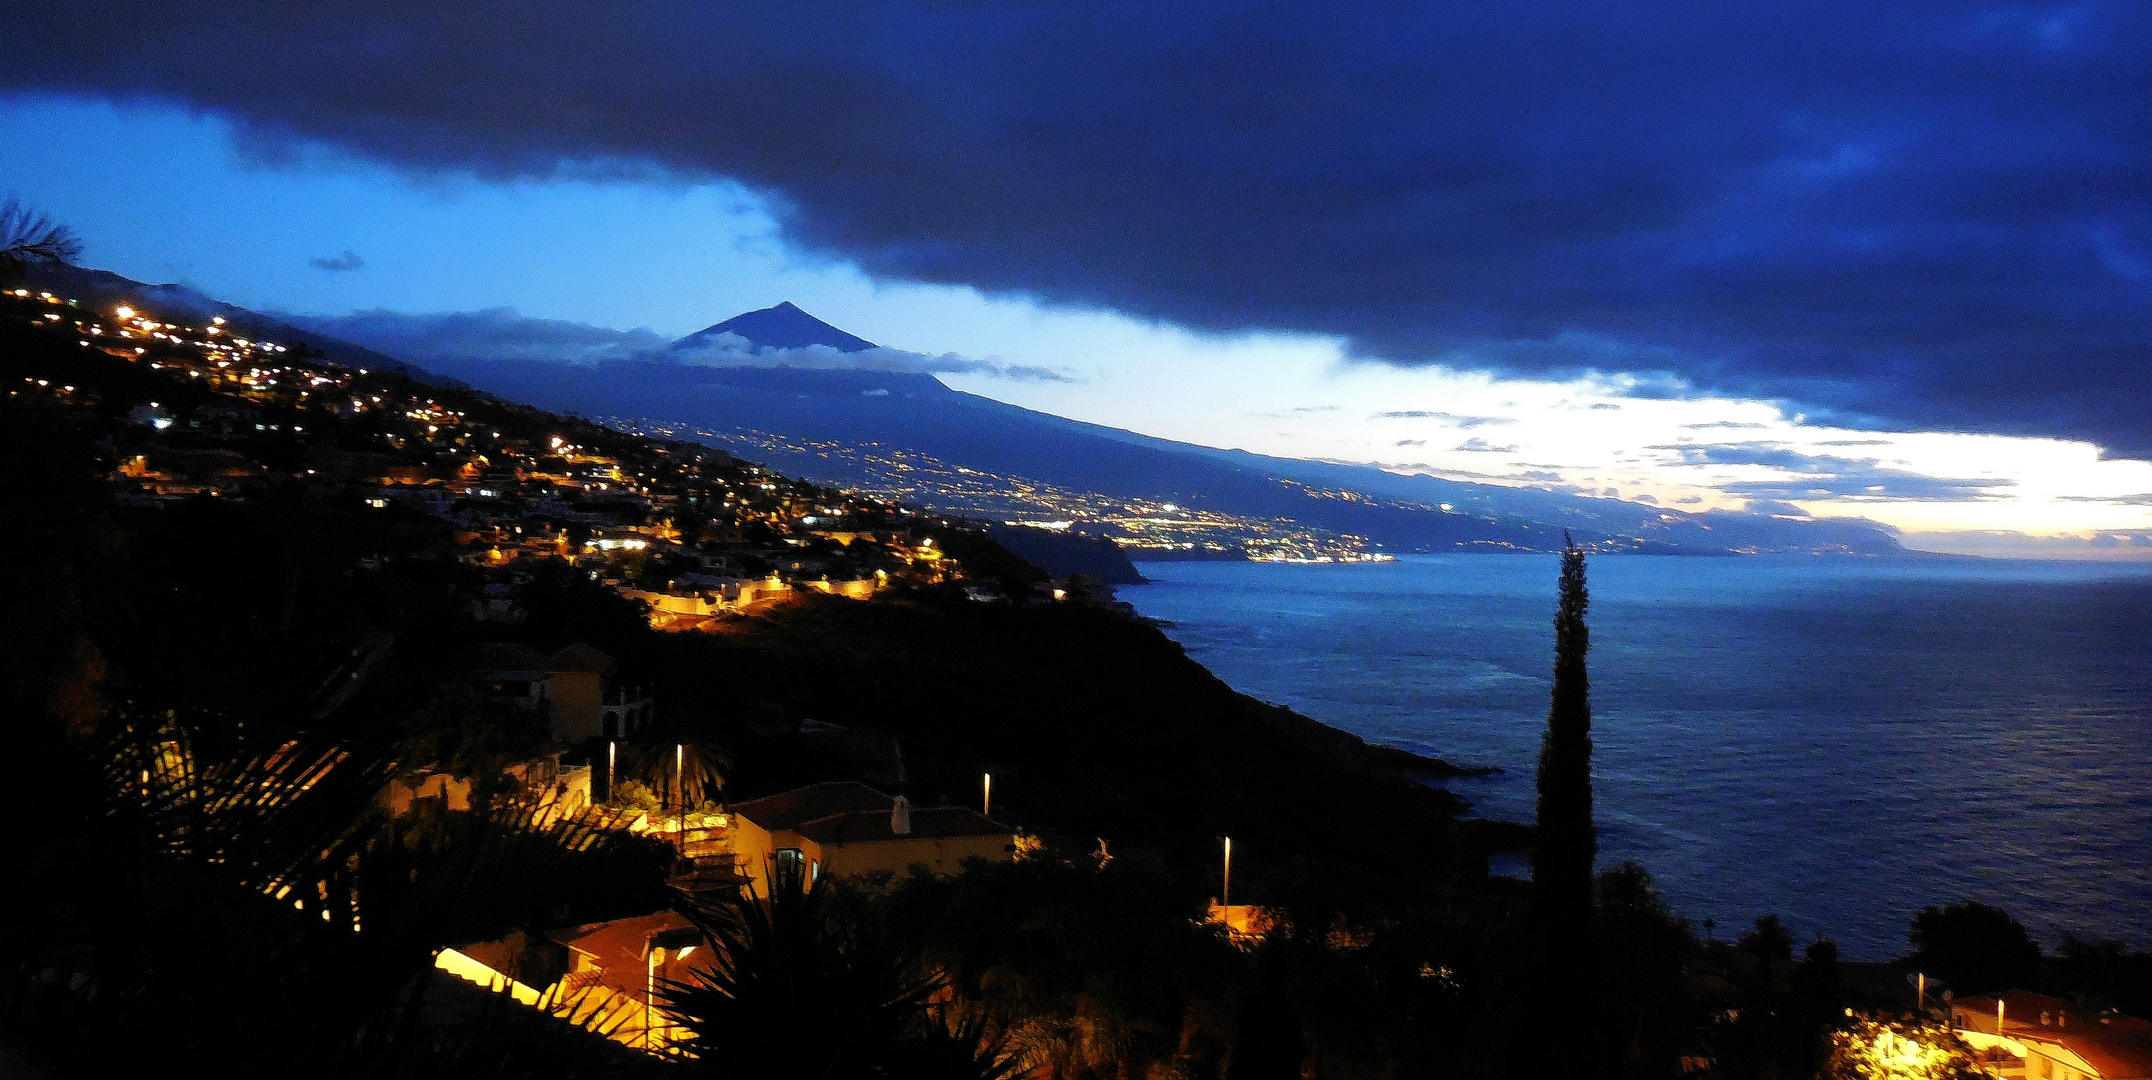 Nordküste Teneriffa mit dem Teide 38178m